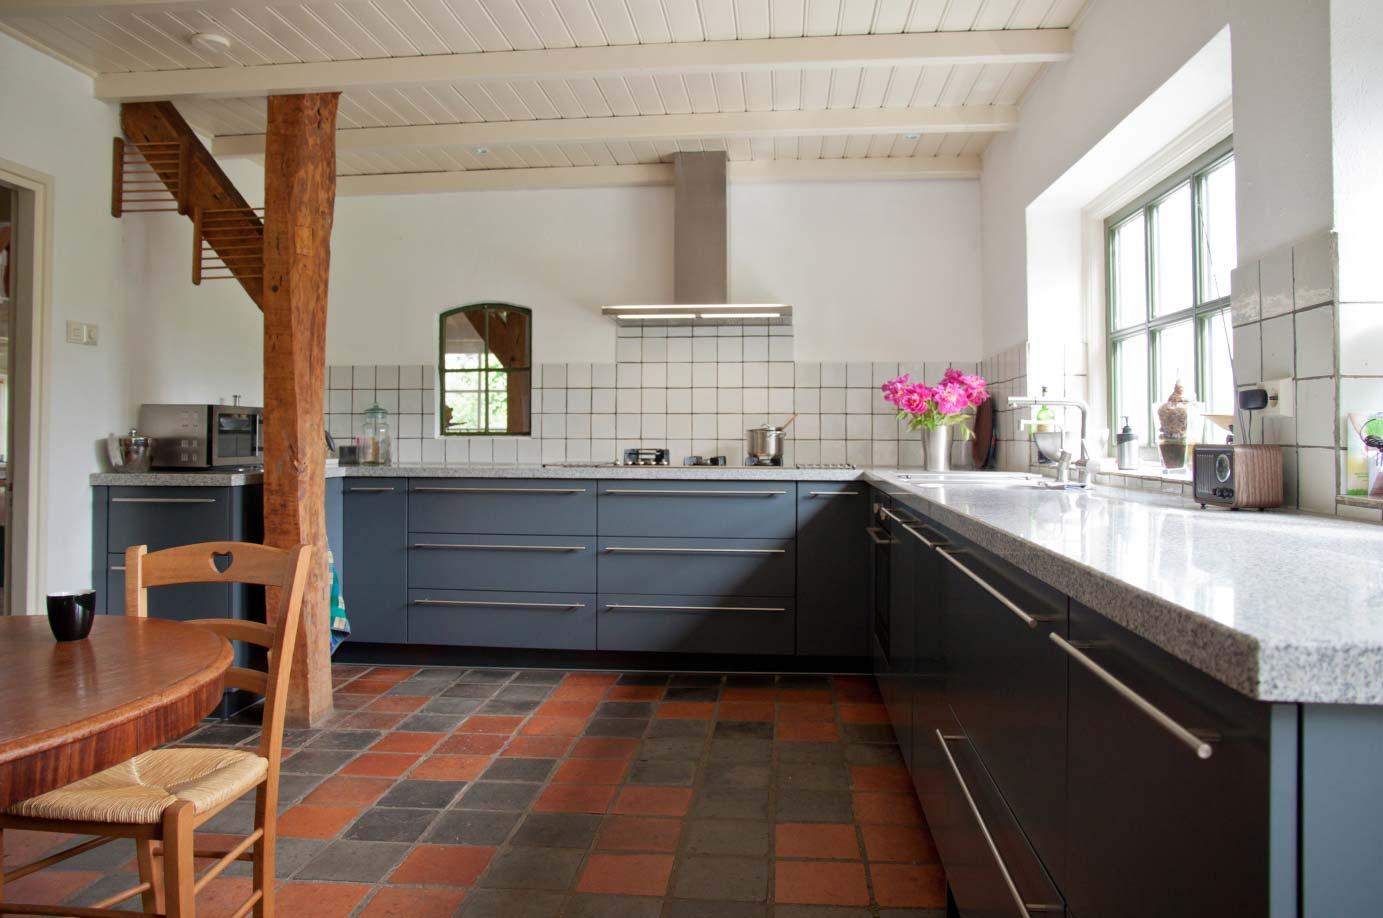 Keuken Kopen Tips : Keukentips. Keuken kopen? De tien beste tips! – DB Keukens